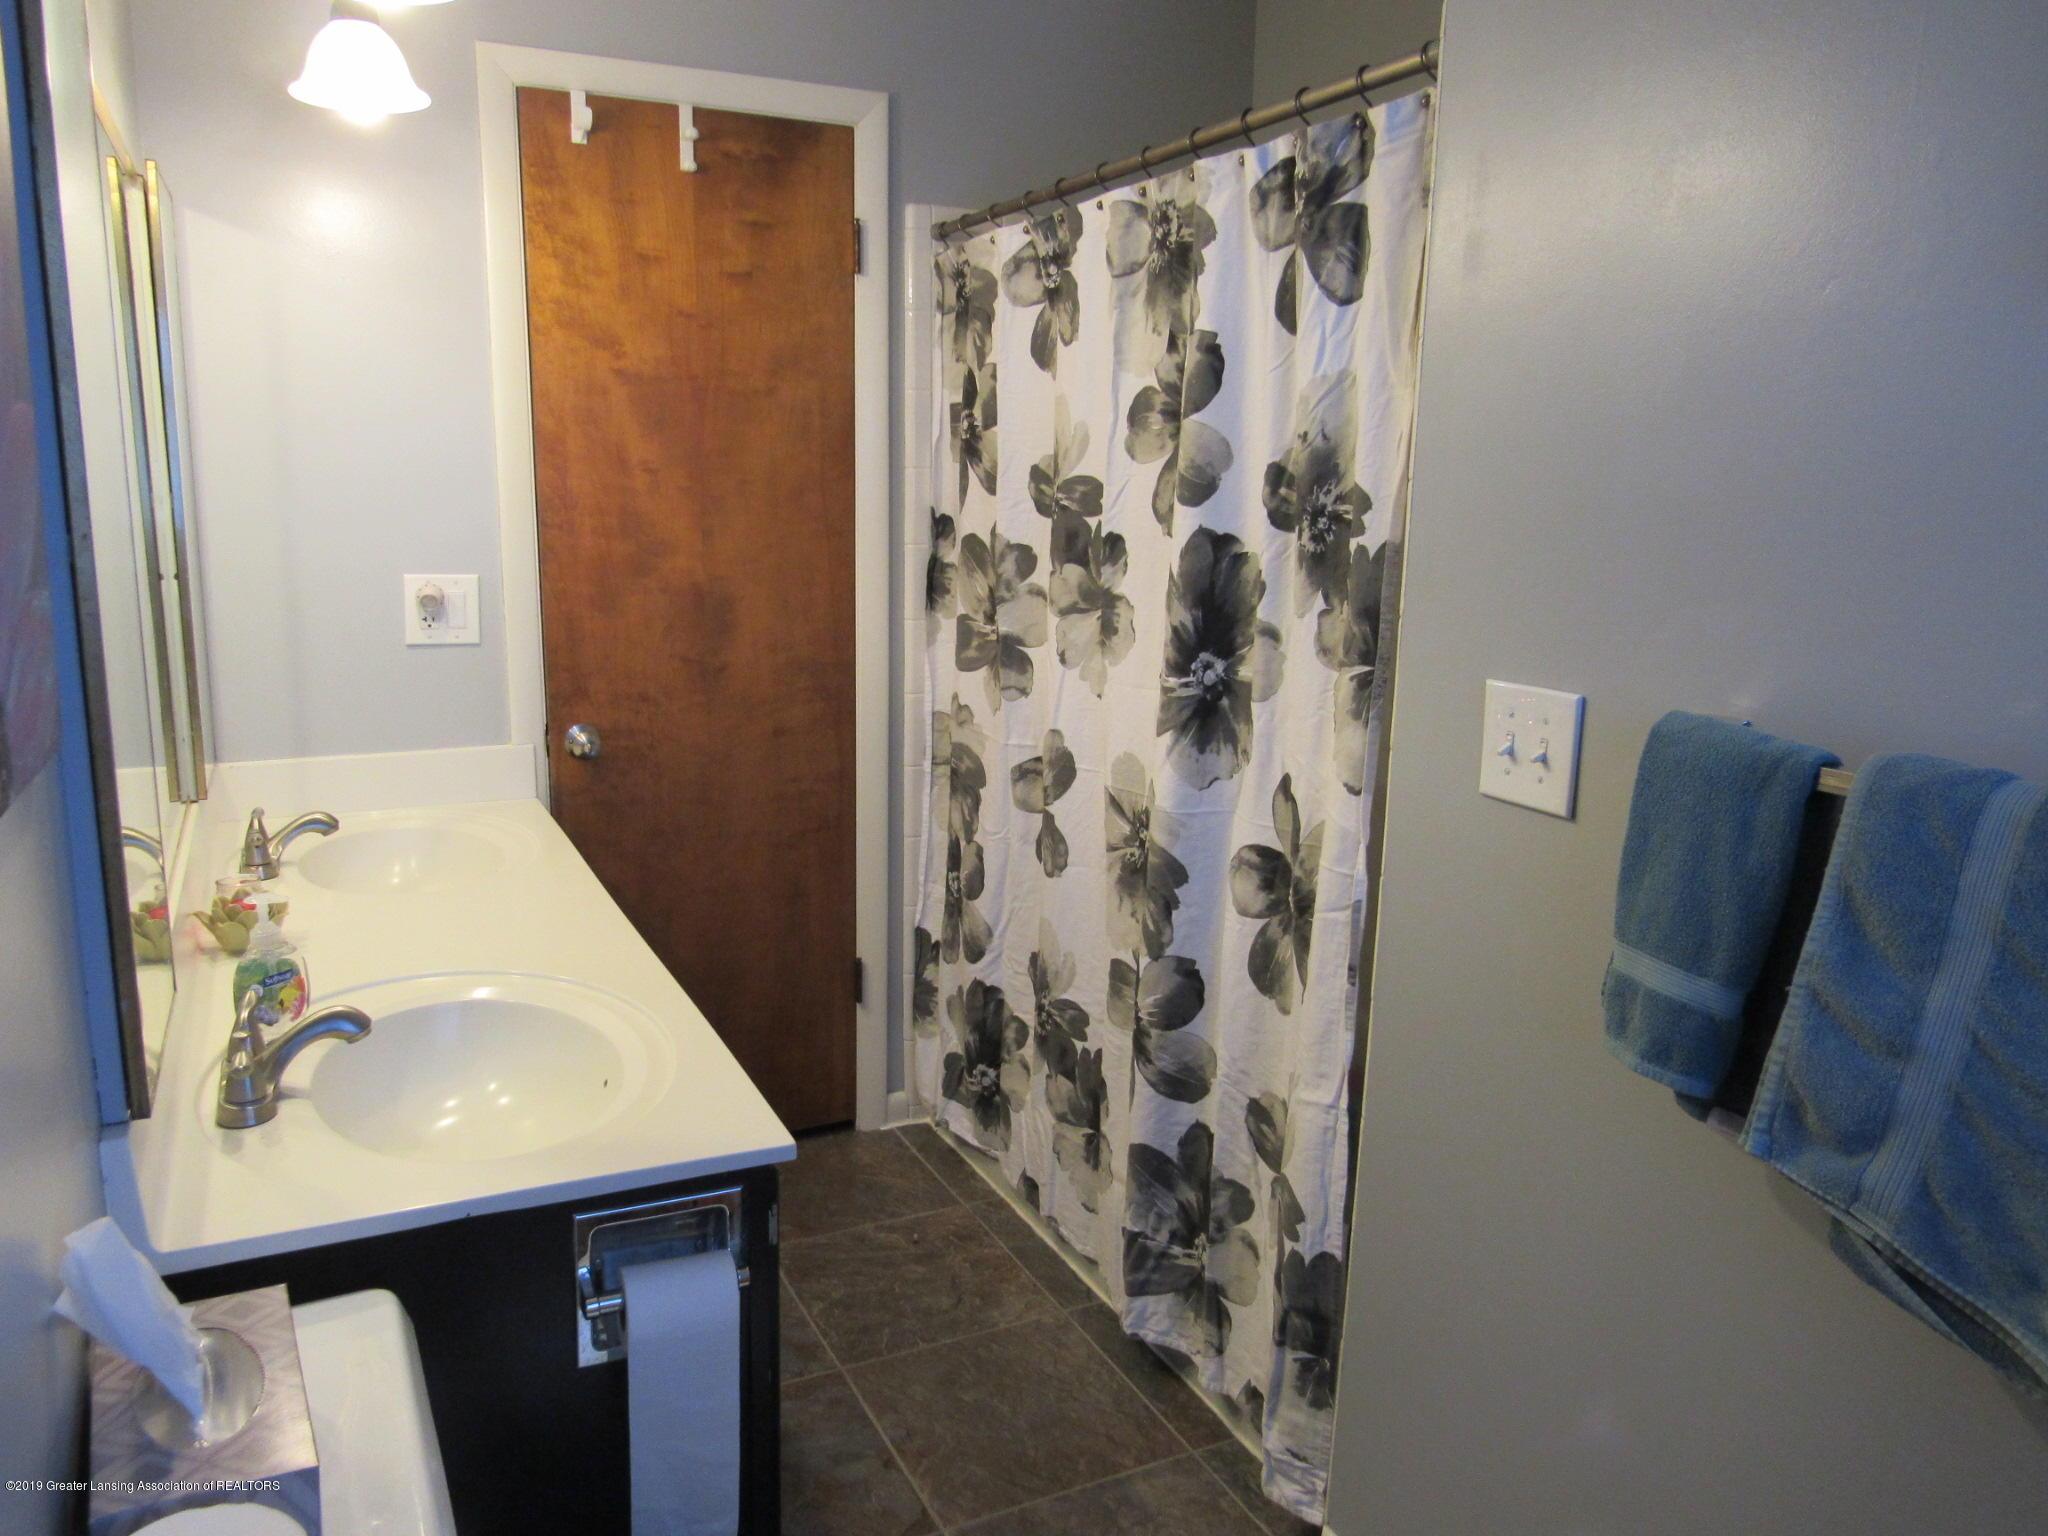 3466 Beechwood Dr - Bathroom 2 sinks - 23